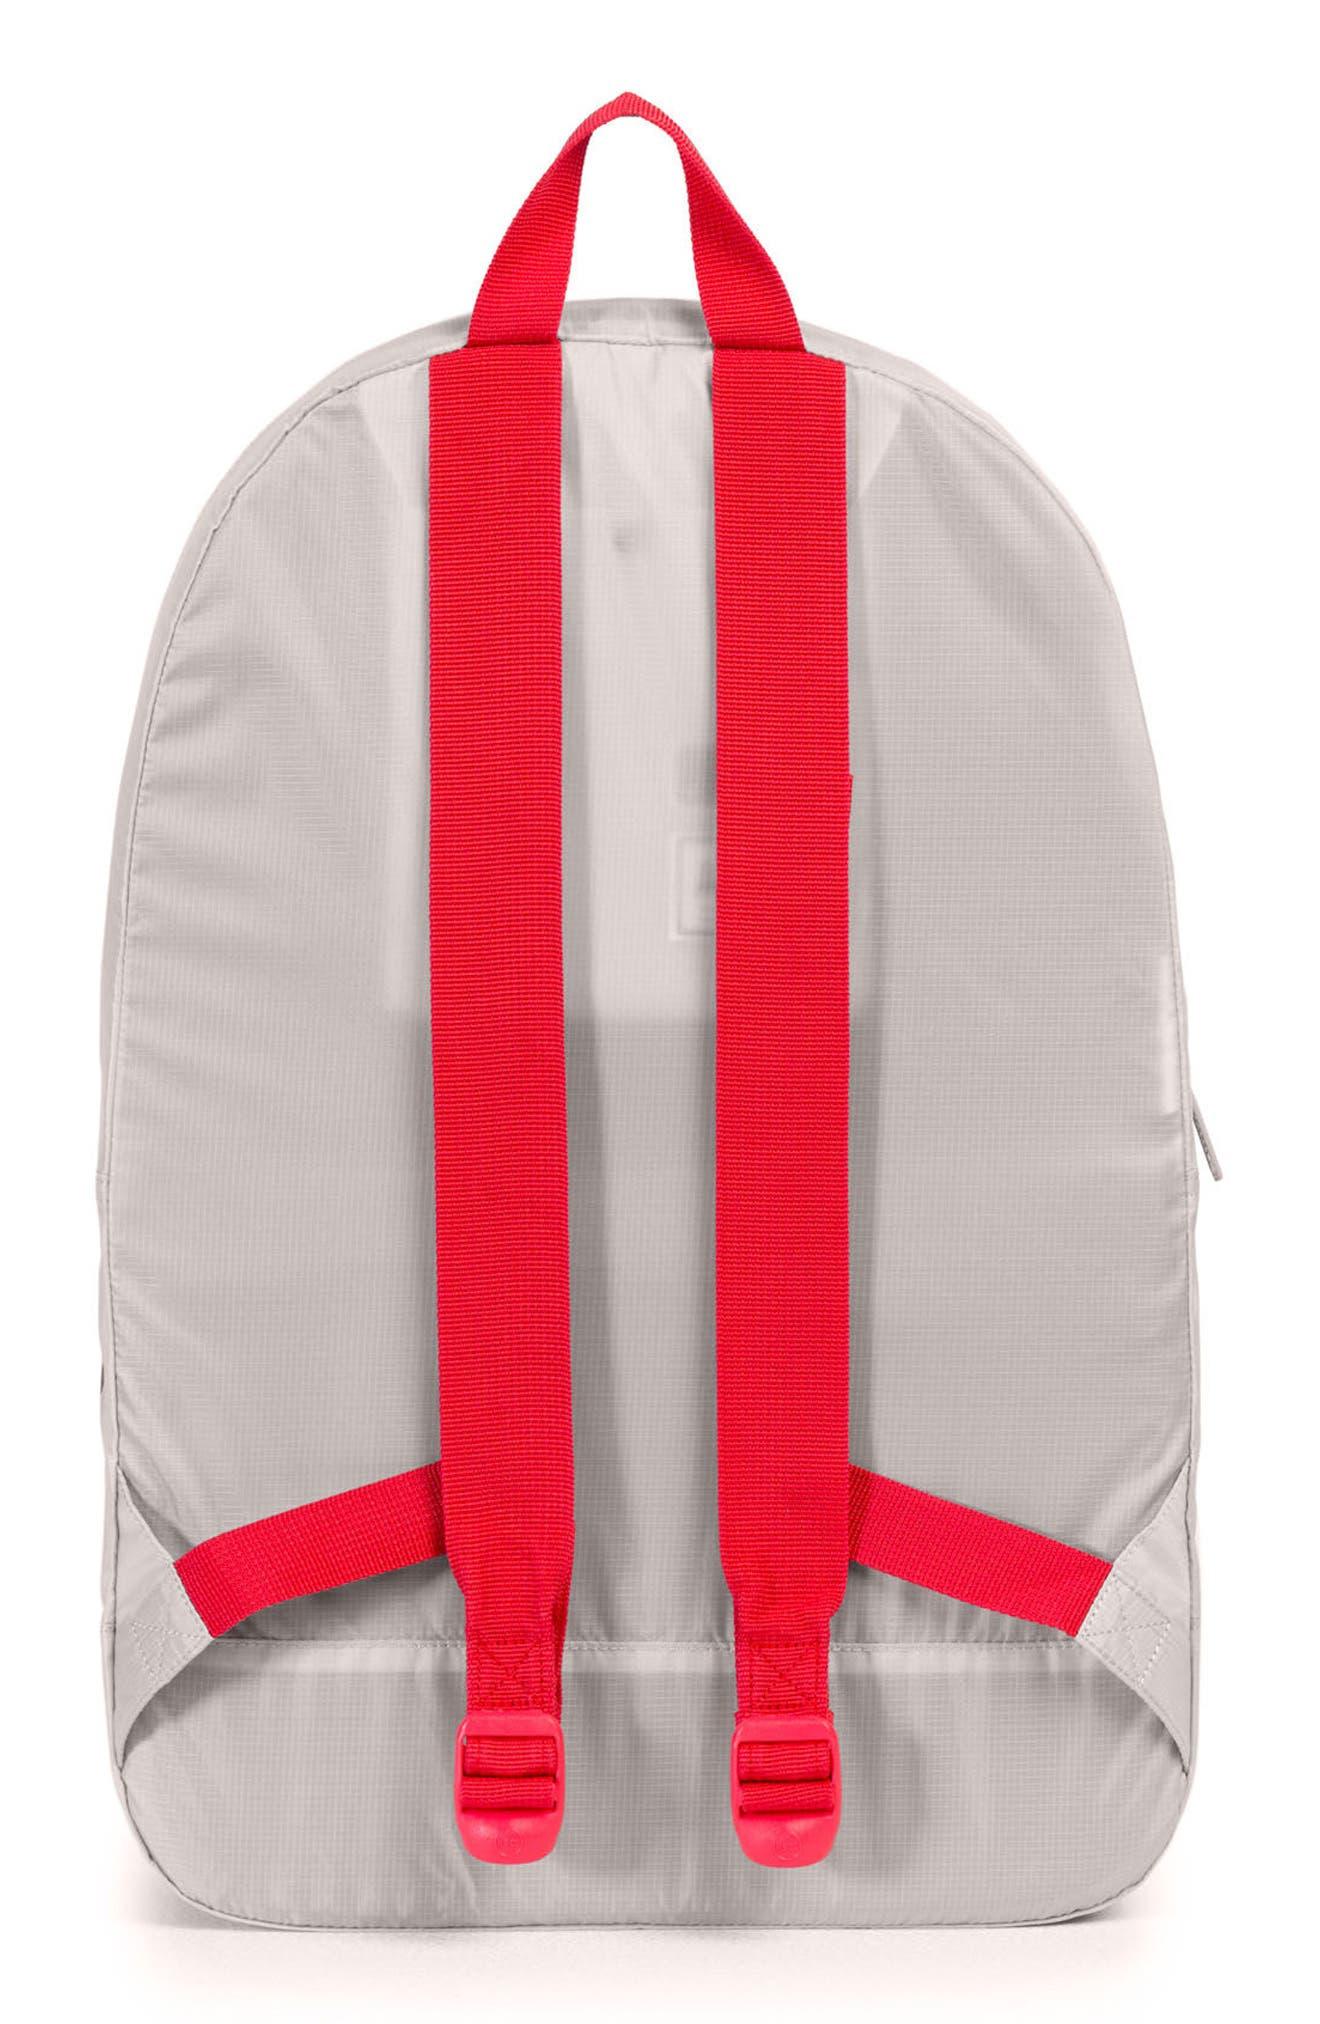 Packable - MLB National League Backpack,                             Alternate thumbnail 2, color,                             020